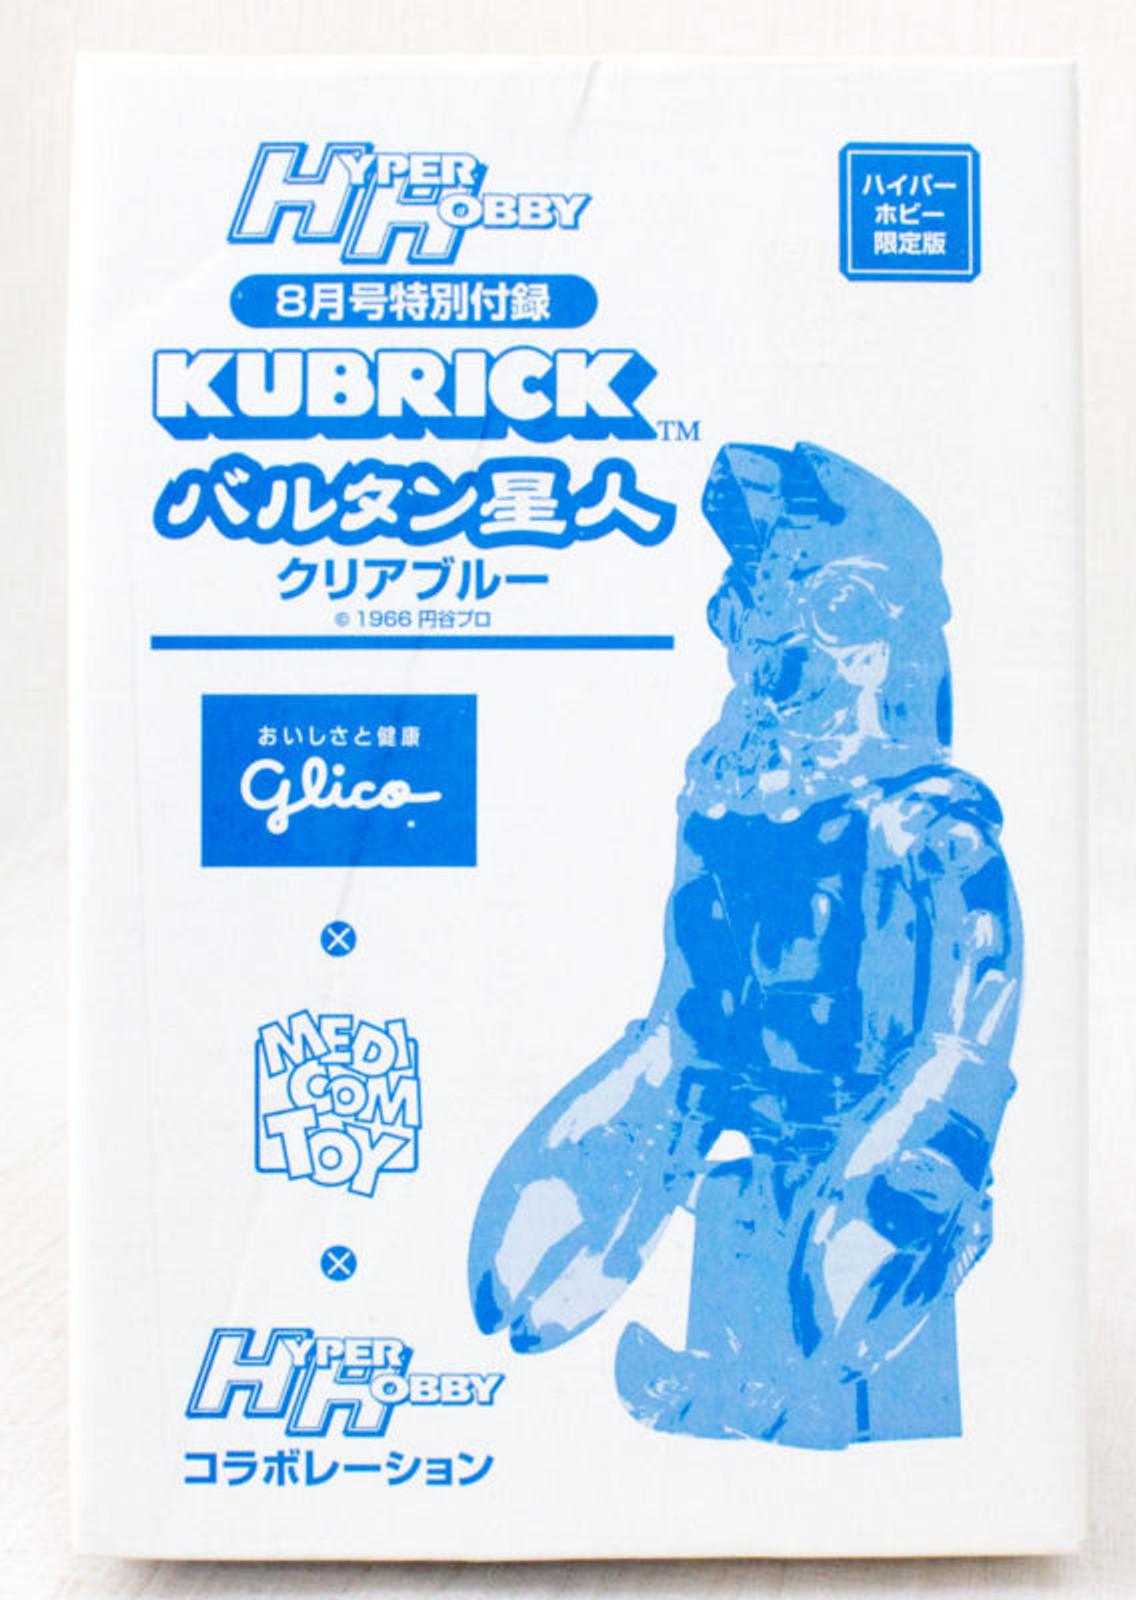 Ultraman BALTAN Alien Kubrick Clear Blue Ver. Glico Medicom Hyper Hobby JAPAN